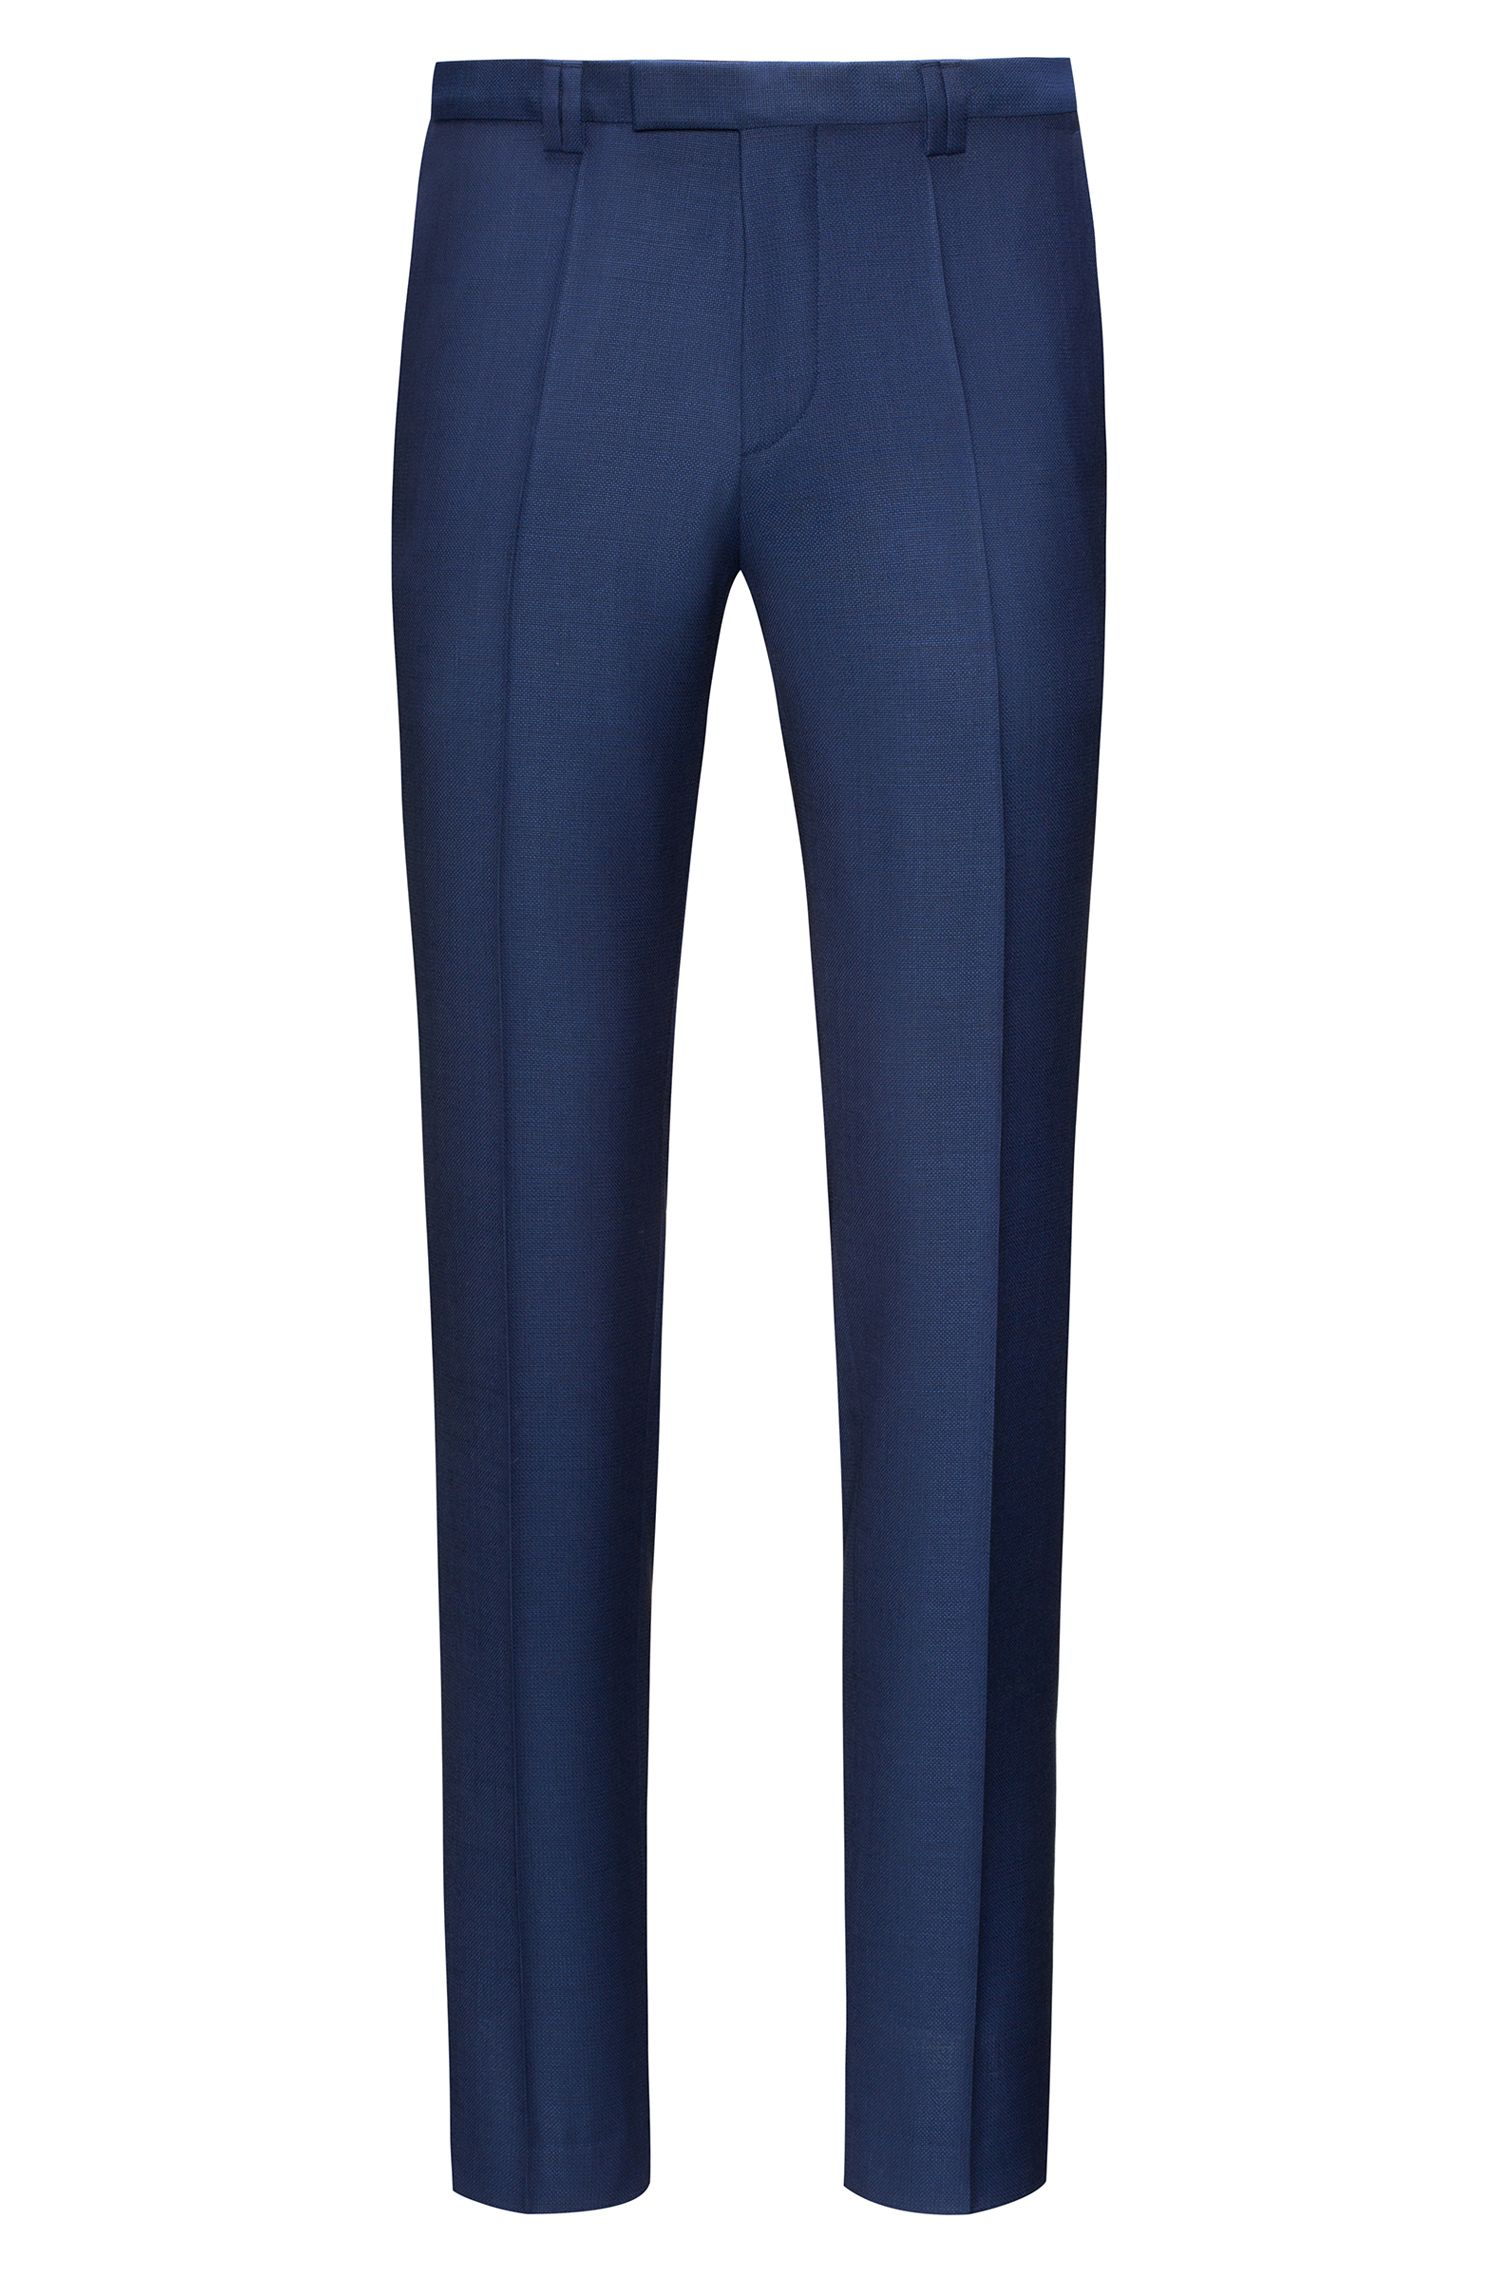 Pantalones extra slim fit en lana entretejida